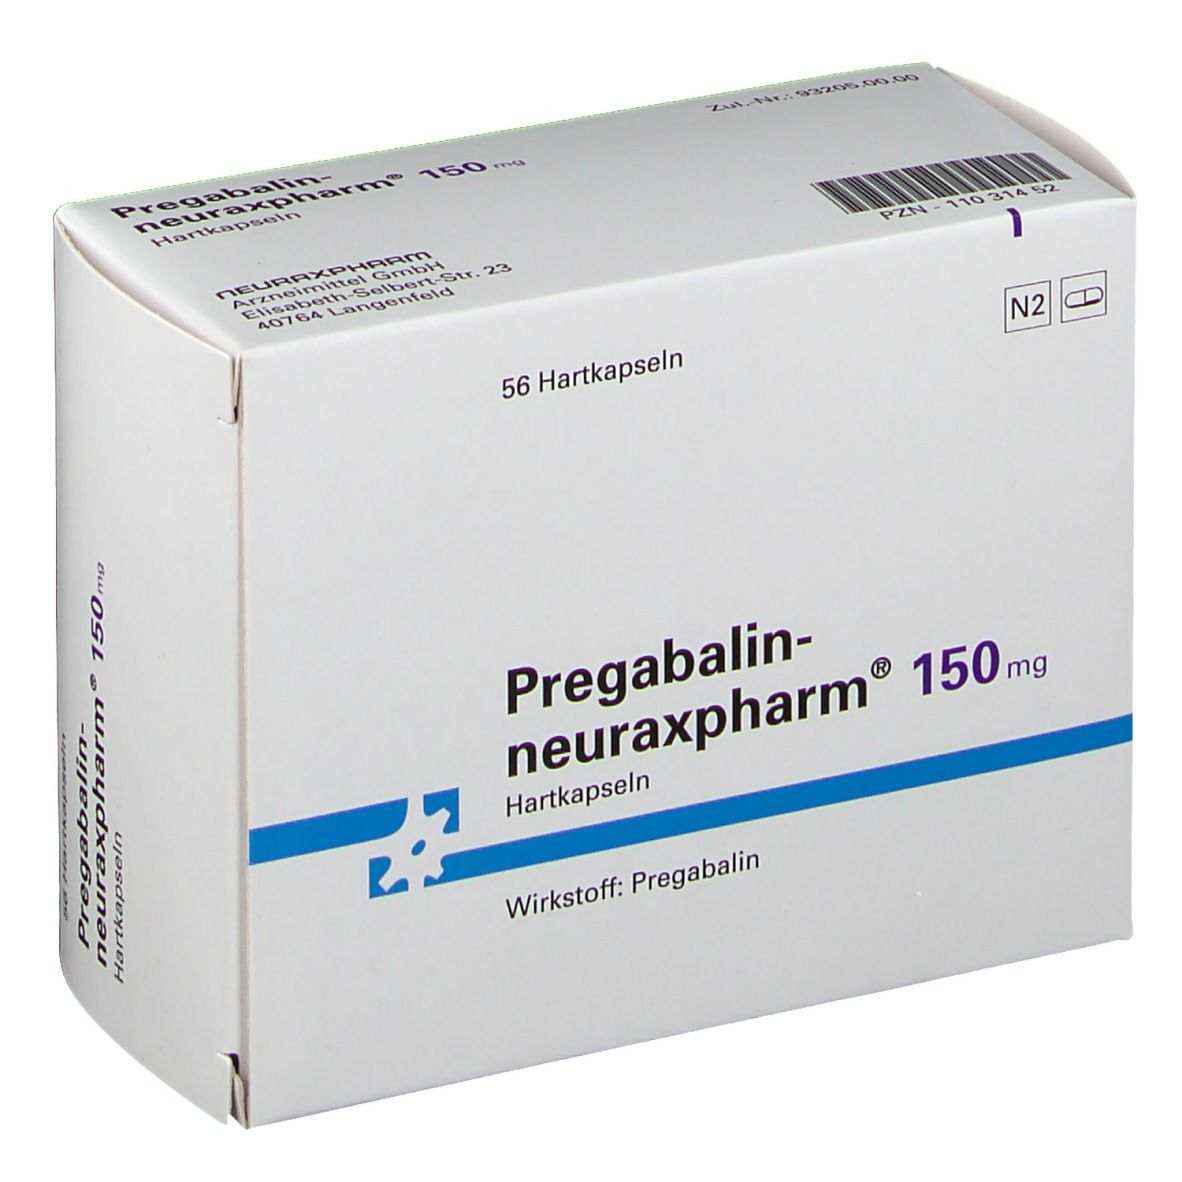 PREGABALIN neuraxpharm 150 mg Hartkapseln